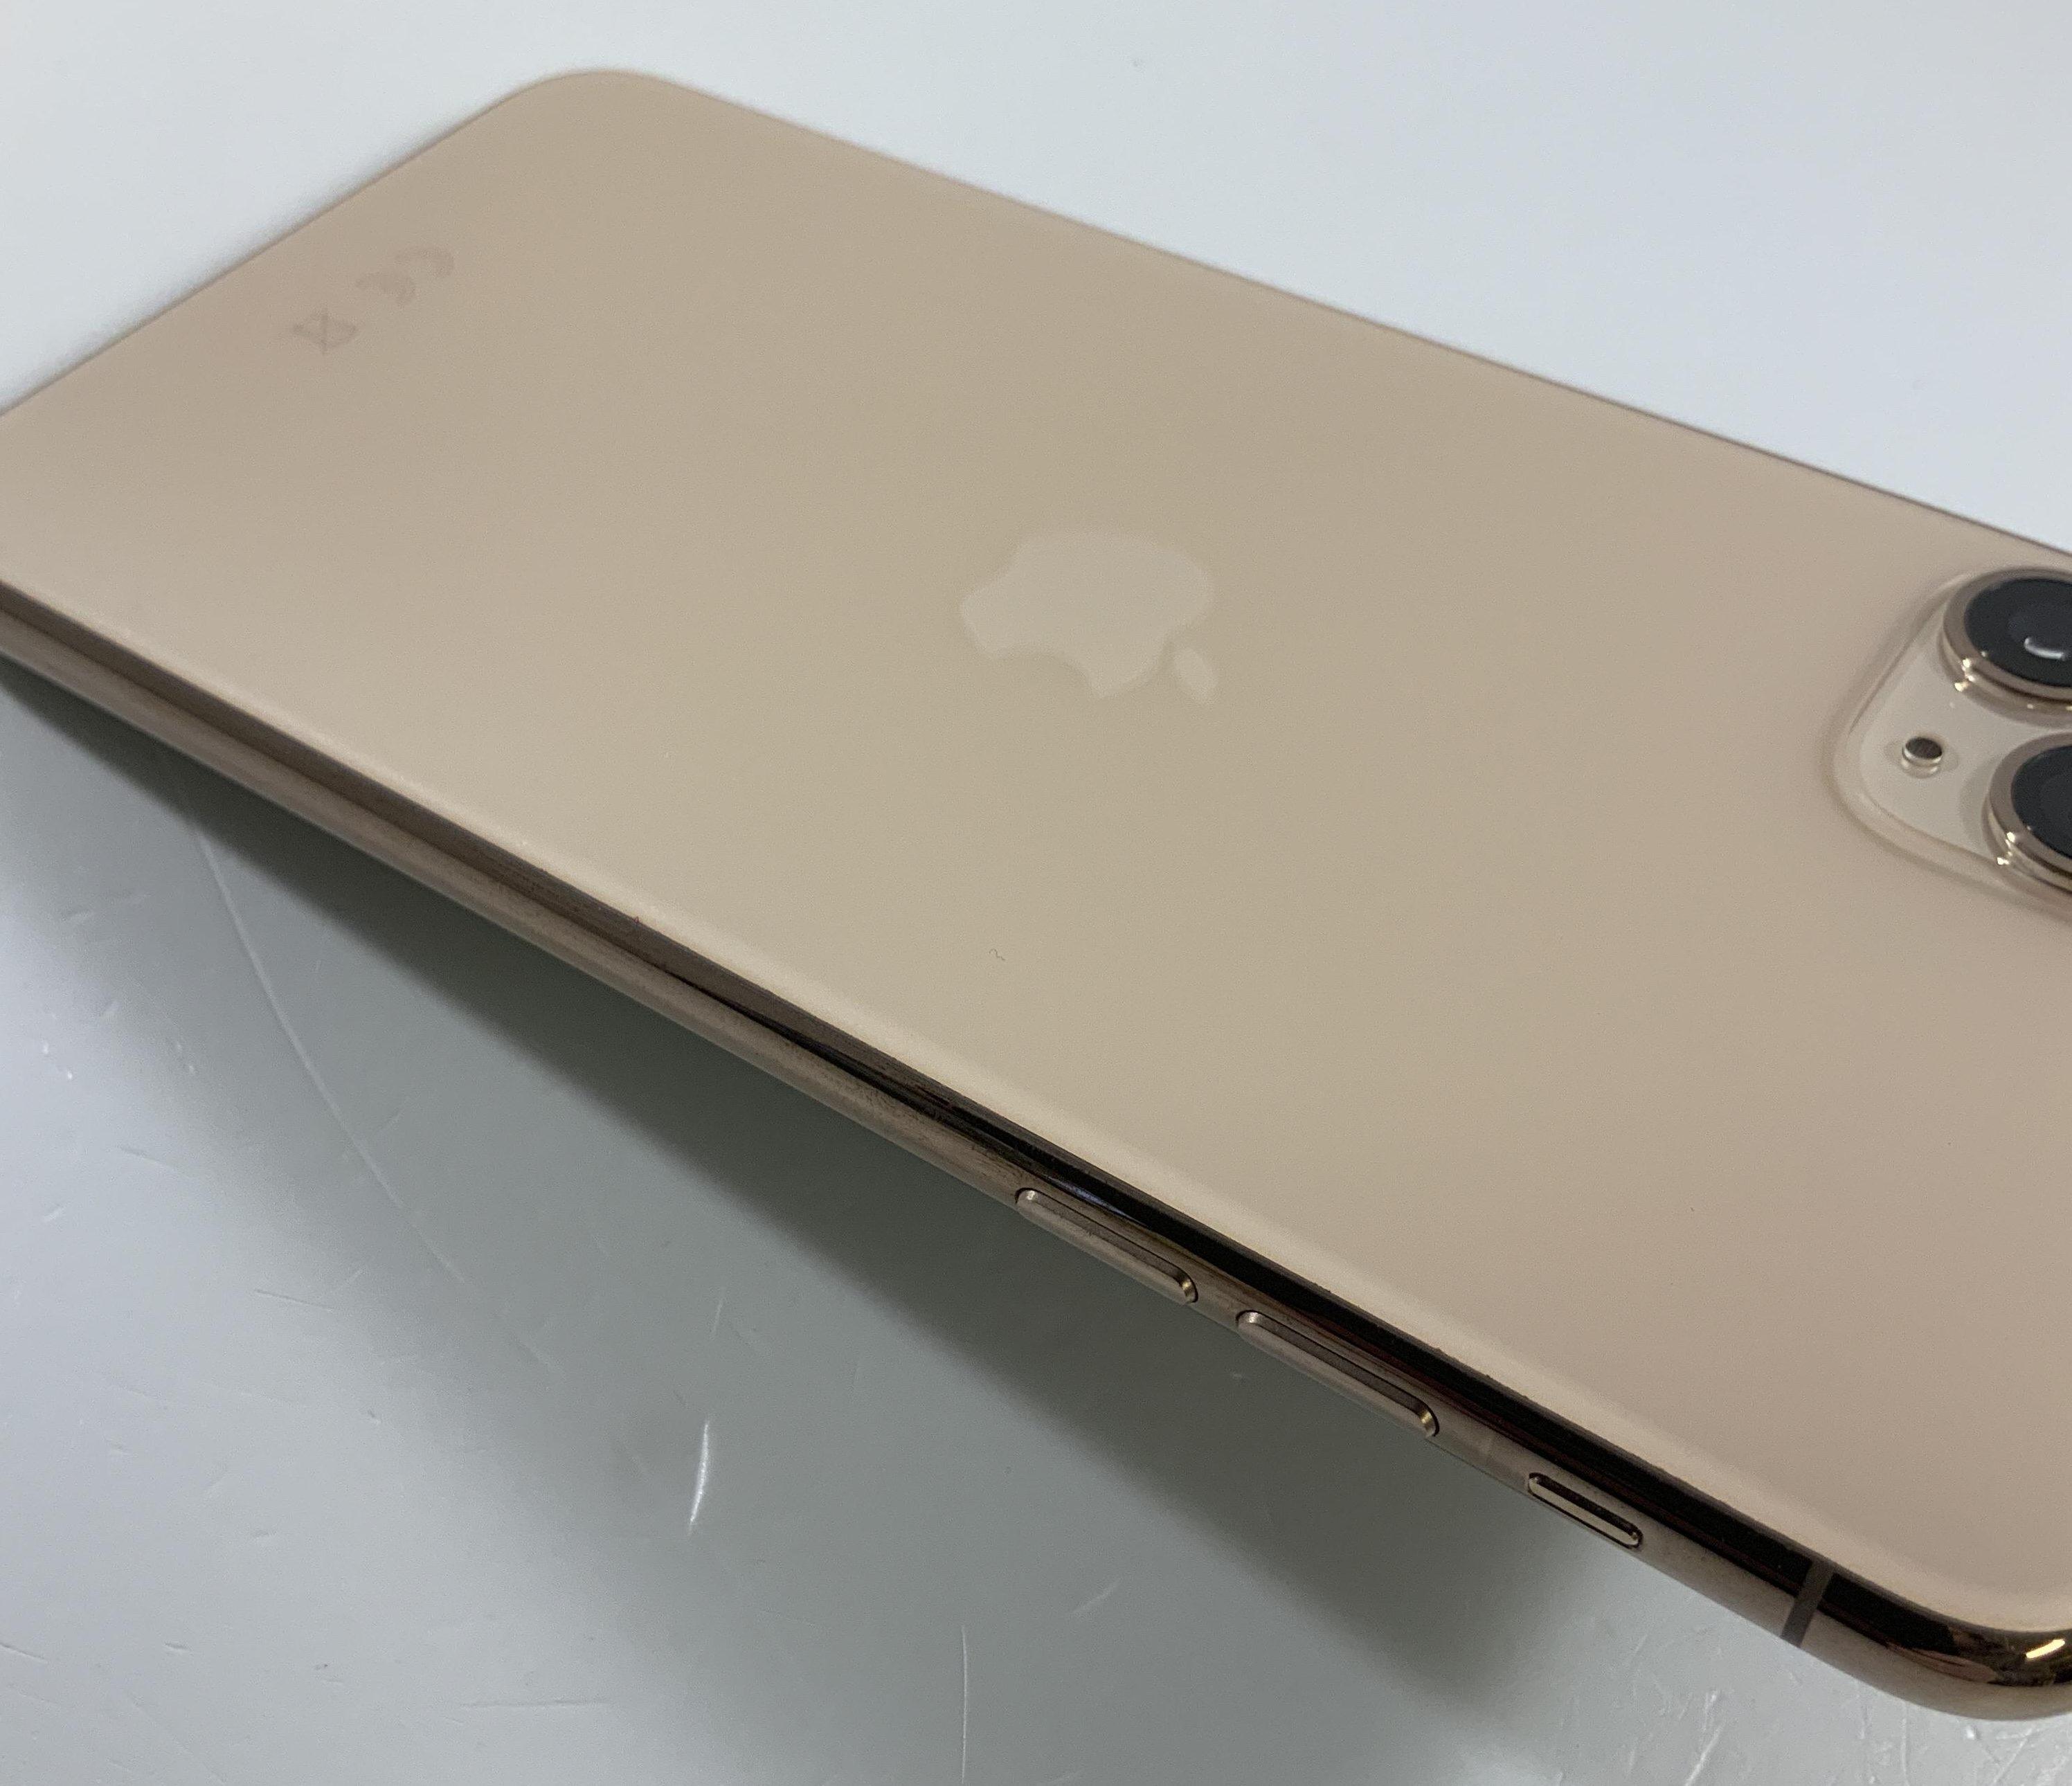 iPhone 11 Pro Max 64GB, 64GB, Gold, Kuva 3